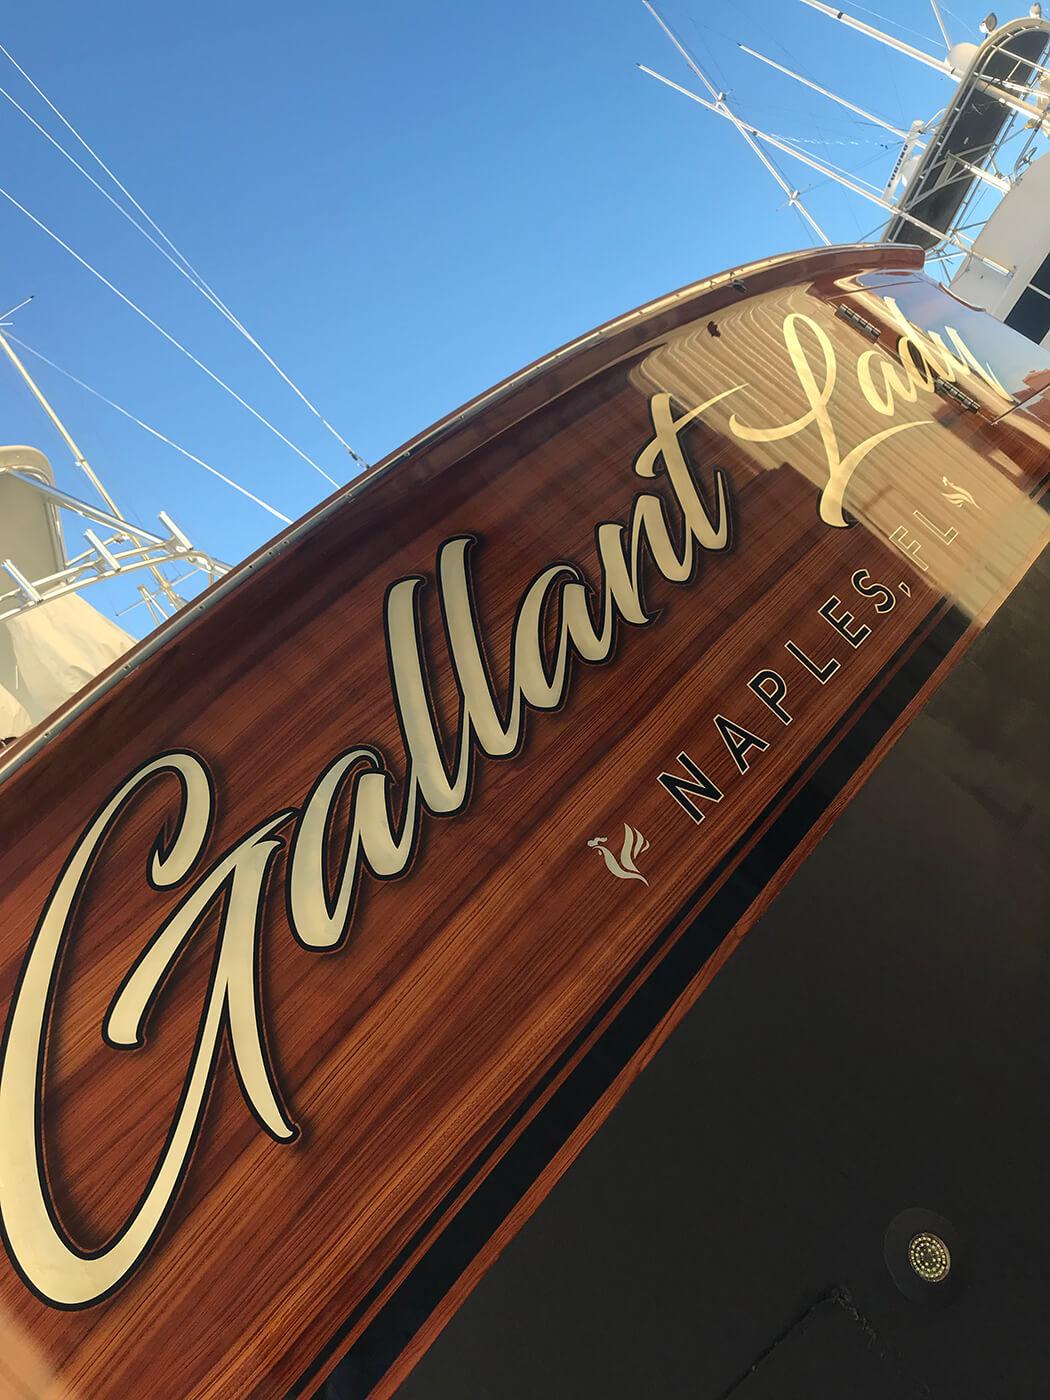 Gallant Lady Naples Florida Boat Transom